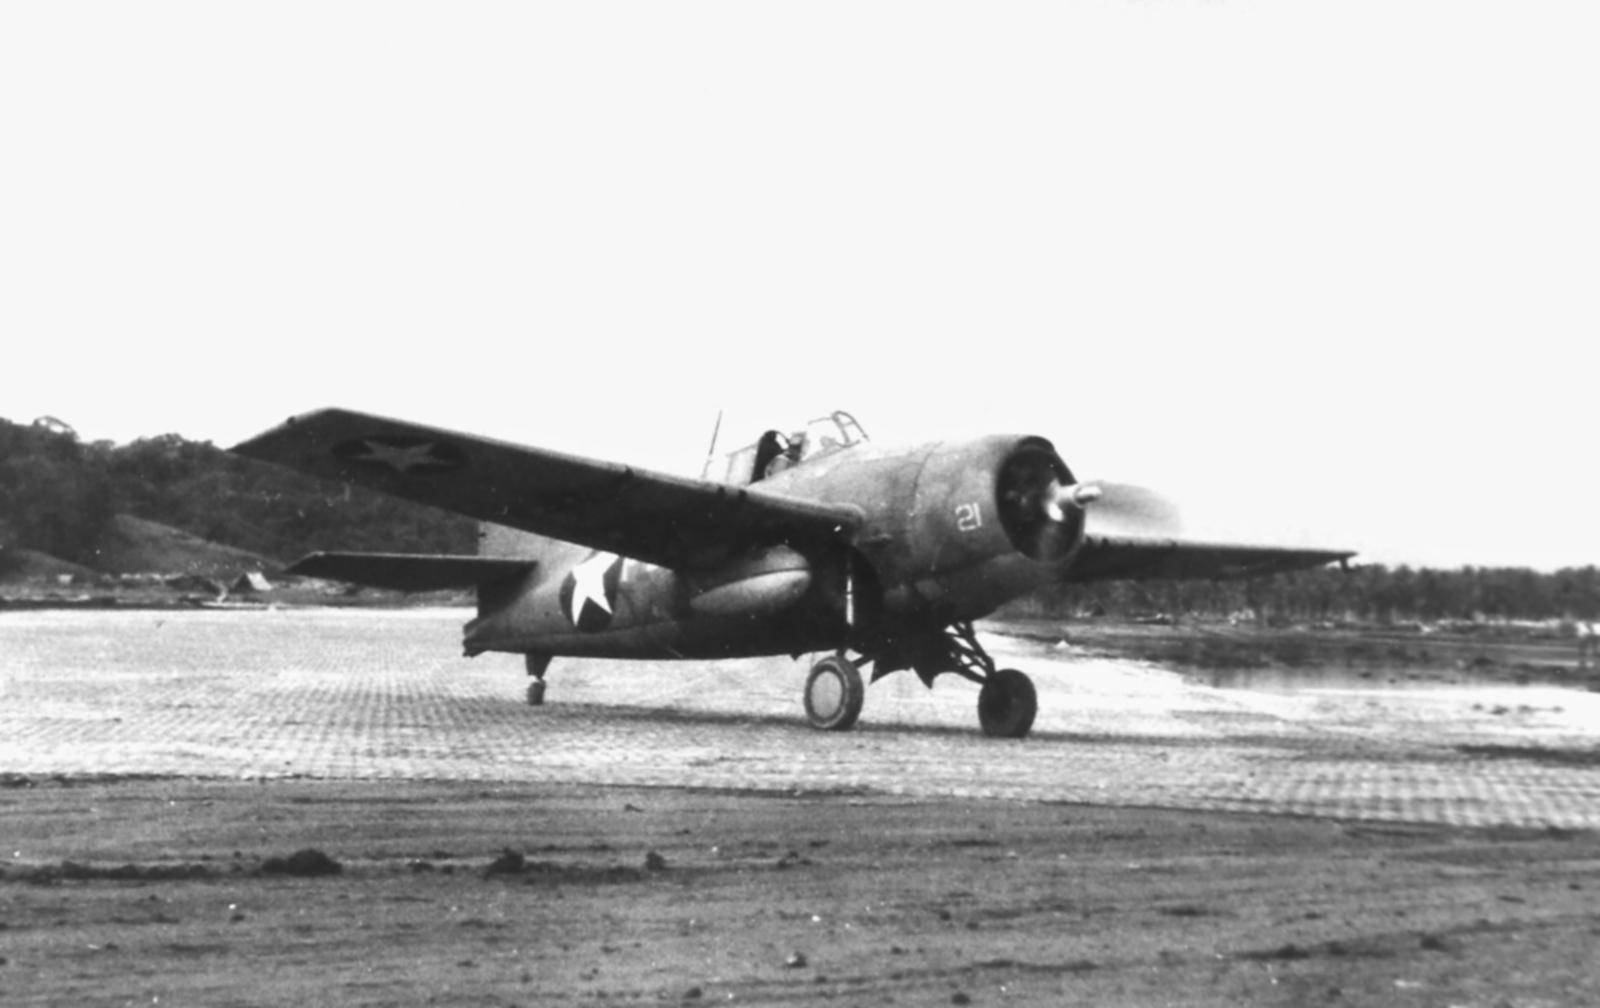 Grumman F4F 3 Wildcats White 21 at Henderson Field Guadalcanal Jan 1943 01